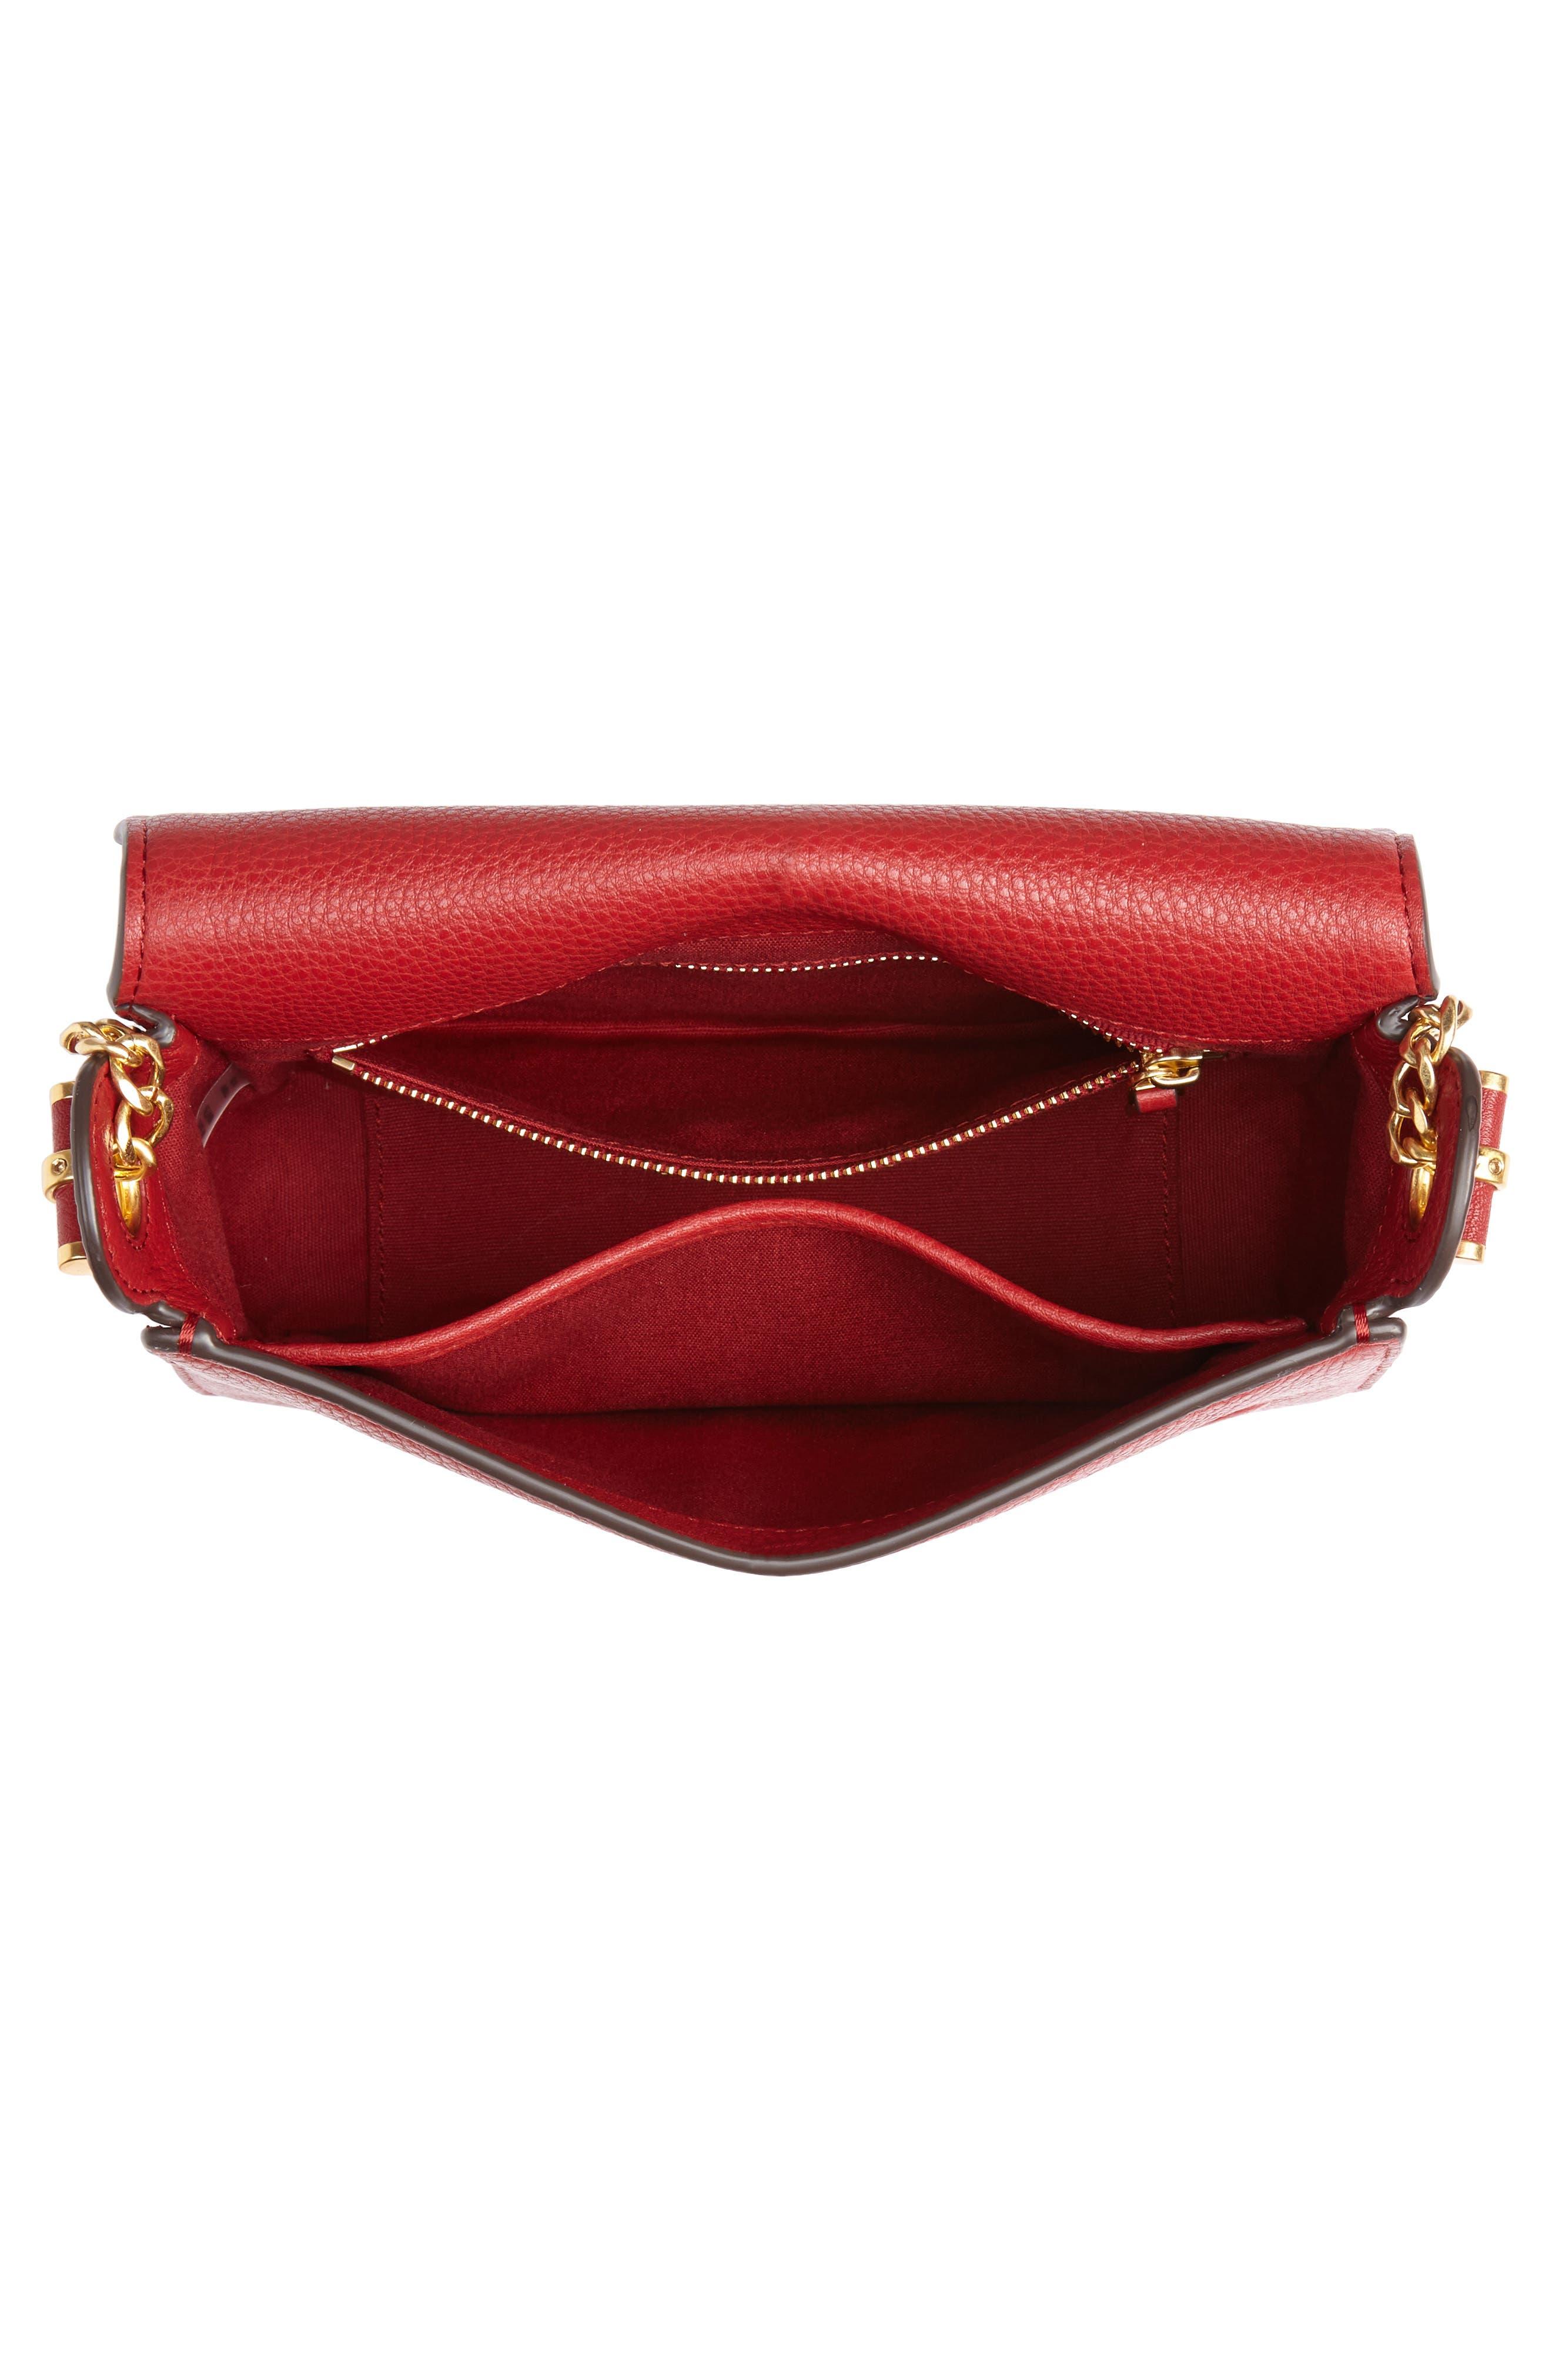 Chelsea Leather Crossbody Bag,                             Alternate thumbnail 4, color,                             REDSTONE